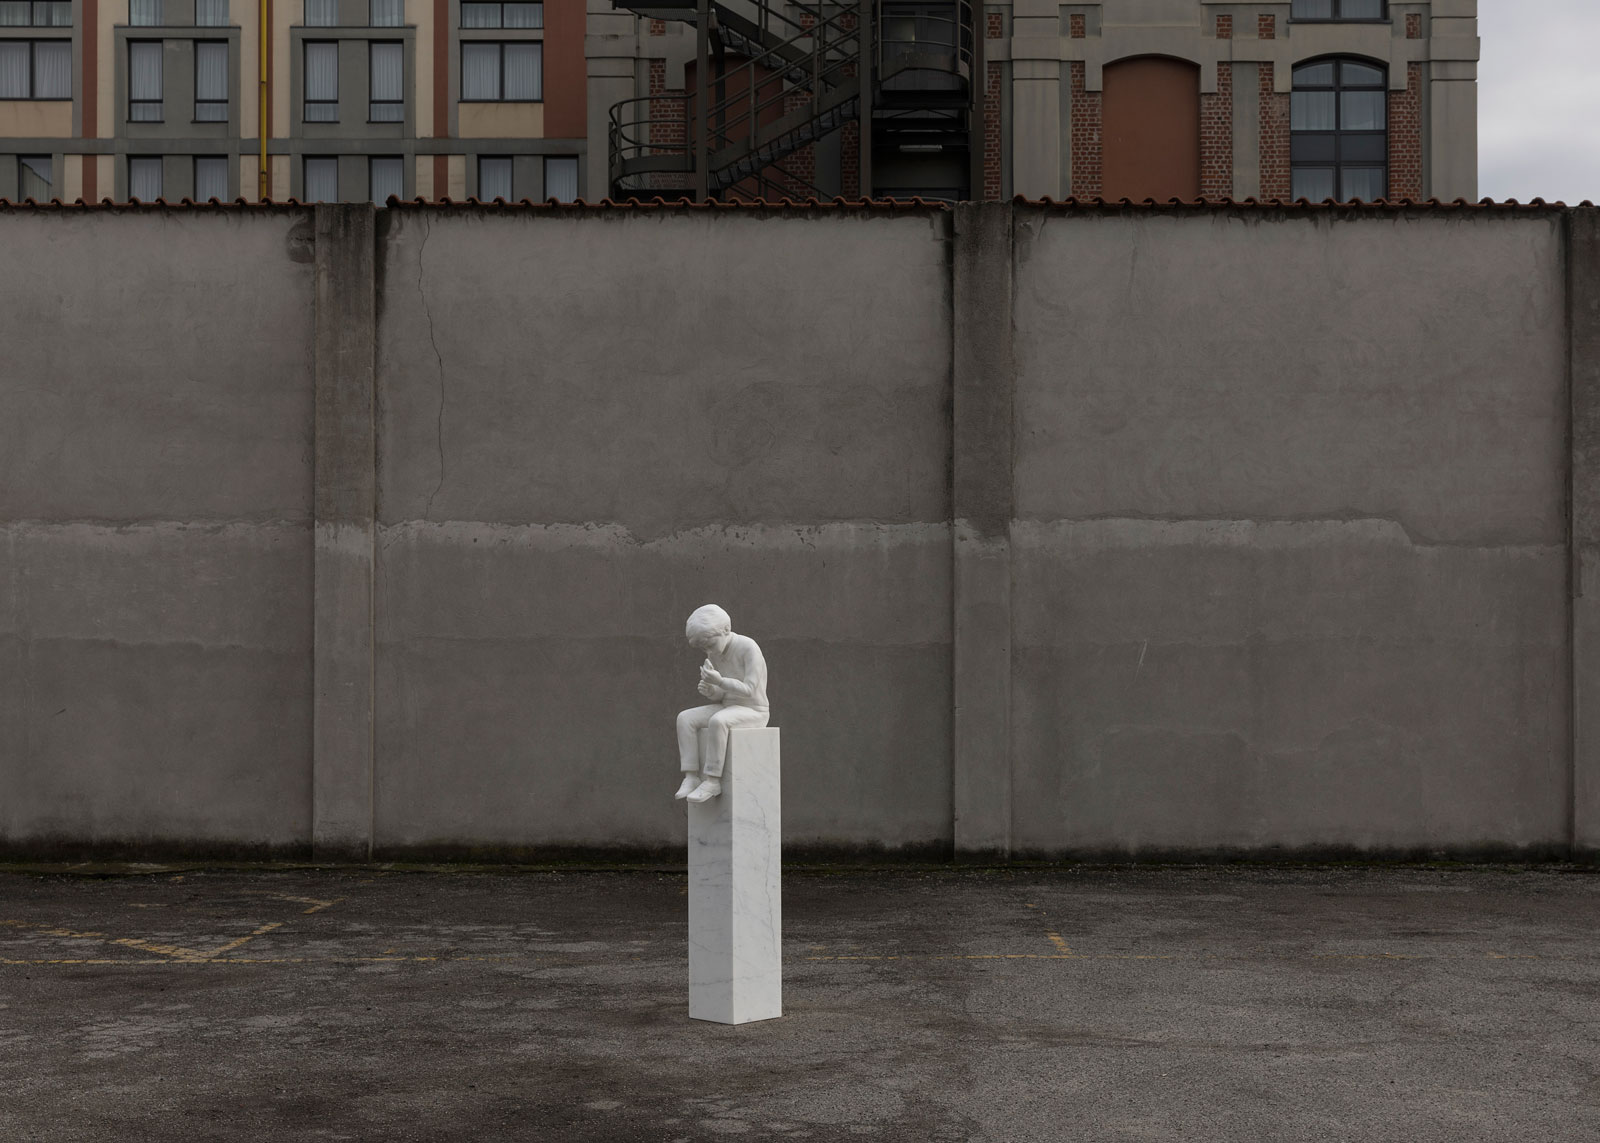 Diego Marcon, <i>Ludwig</i>, 2018. Photo: Nicola Gnesi